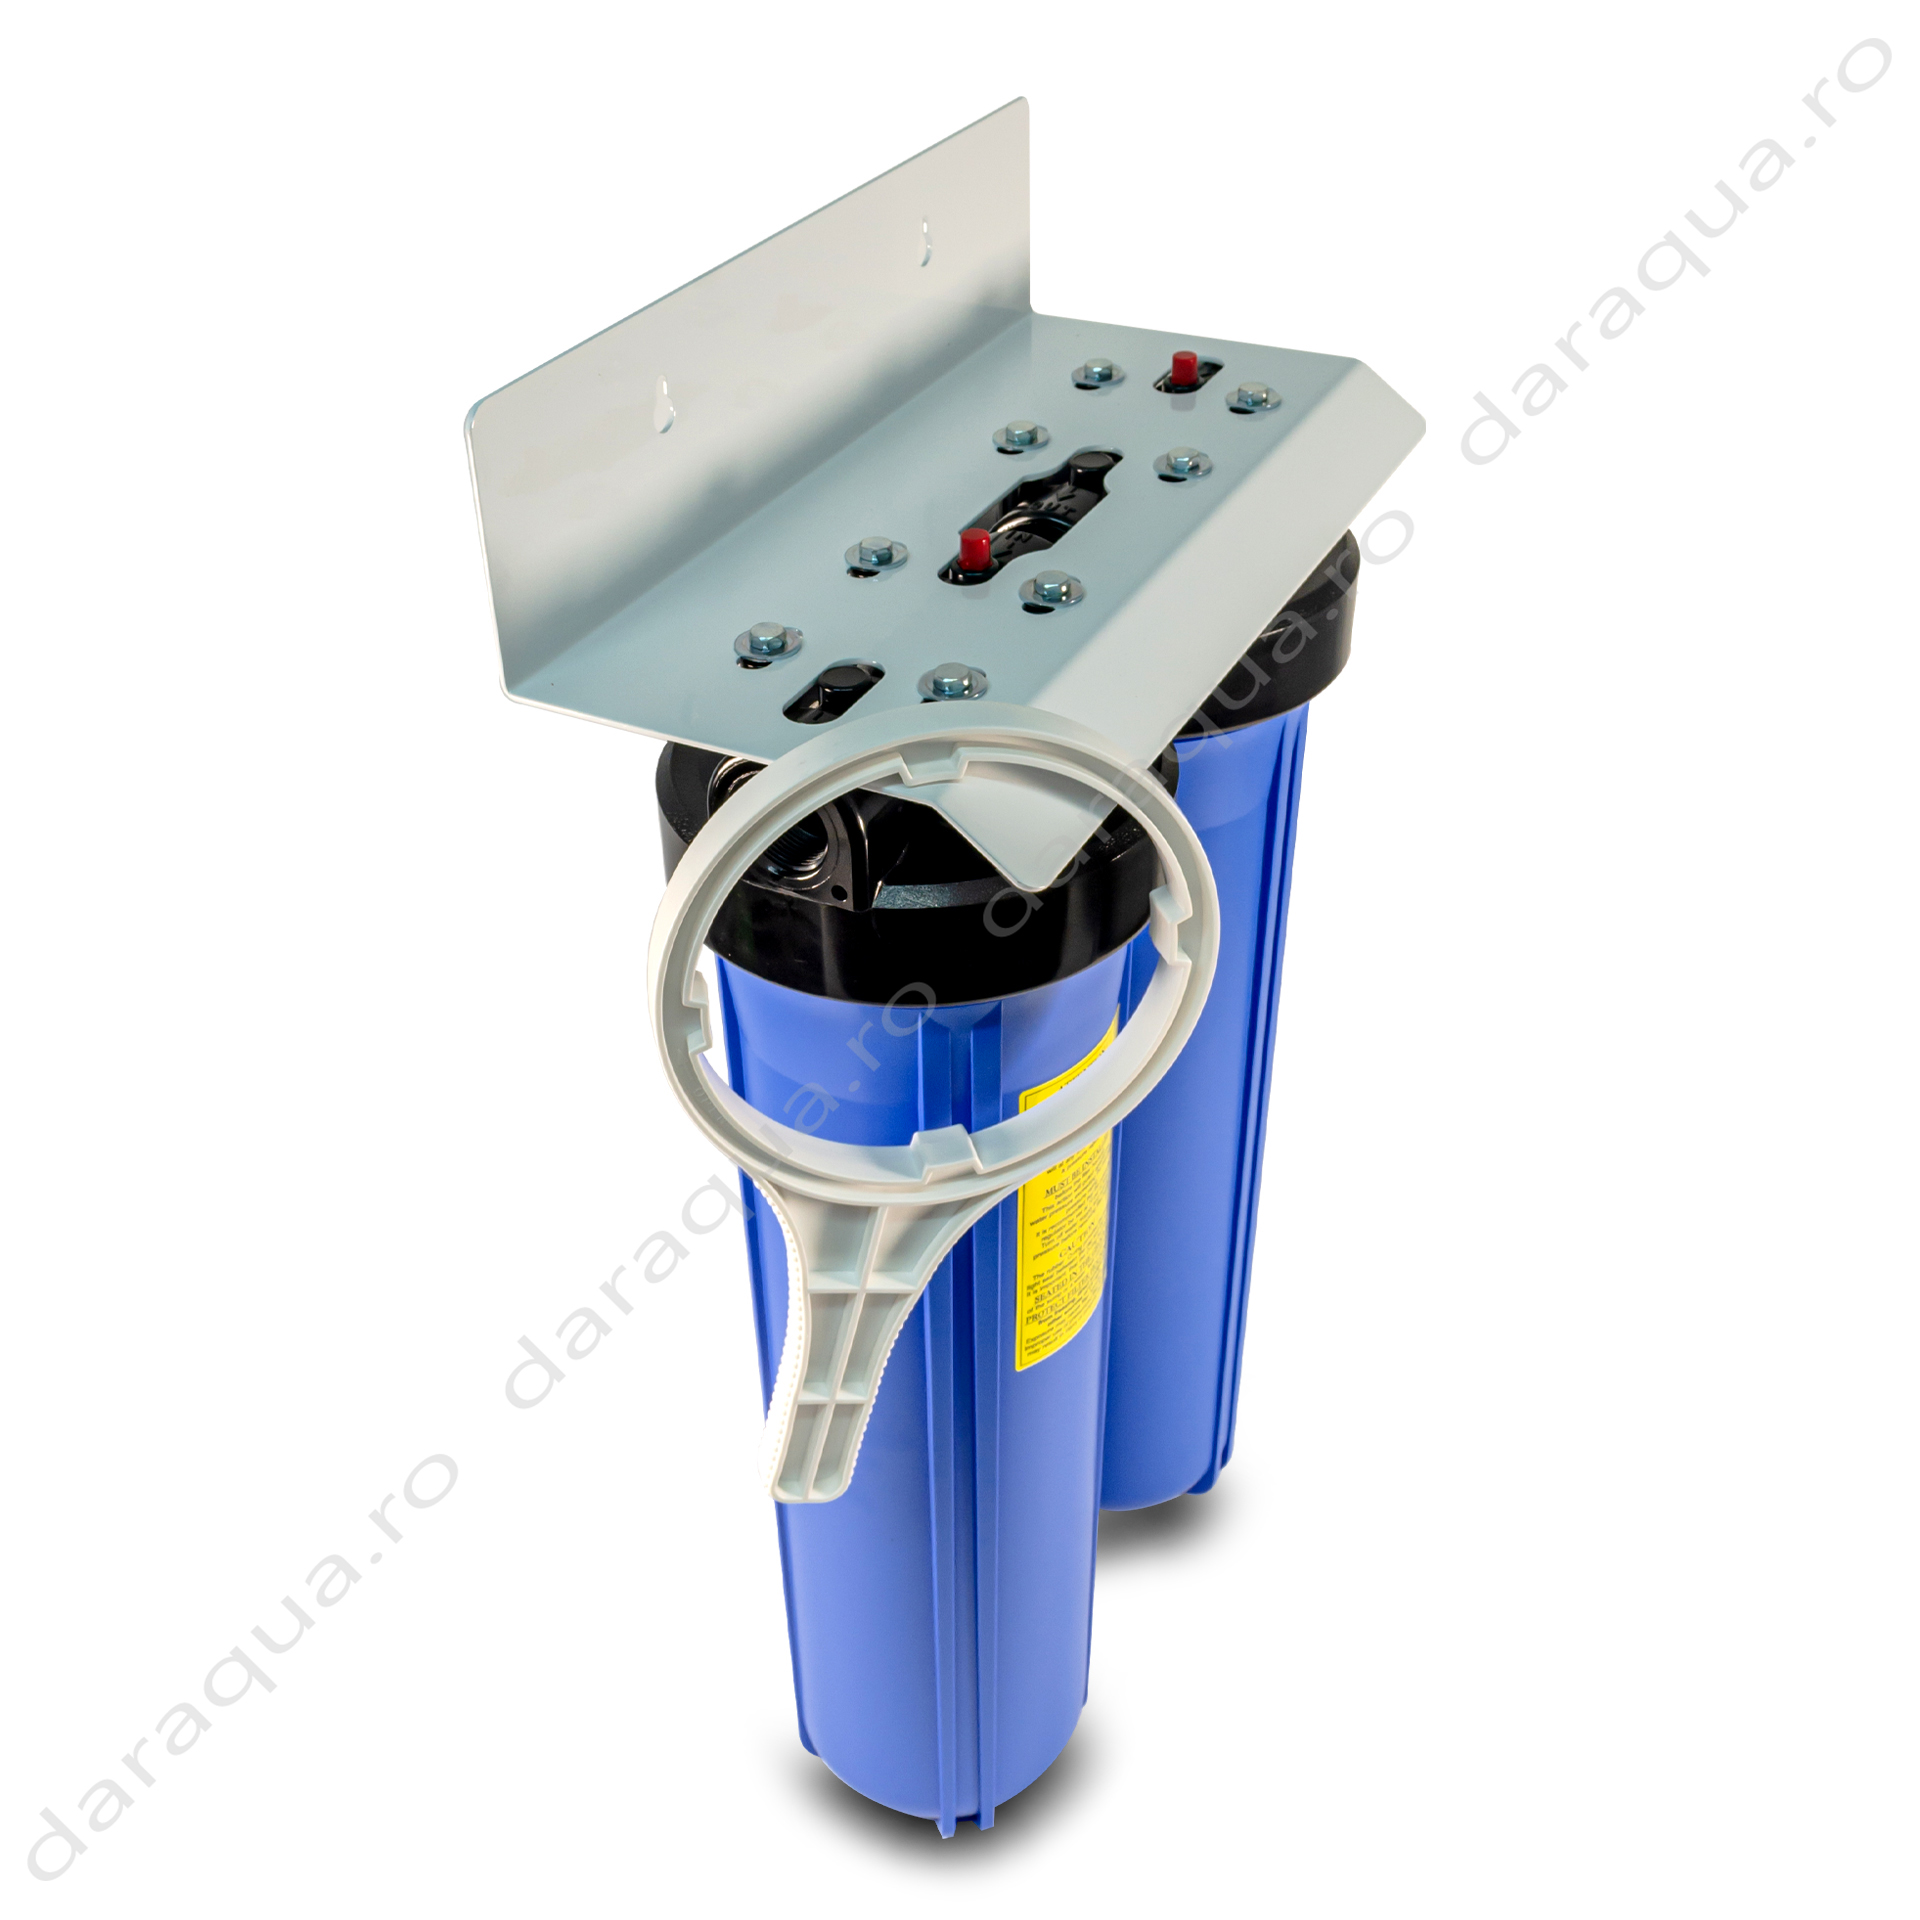 "Filtru Duplex Big Blue 20"" cu Carbune Activ si filtrare mecanica"